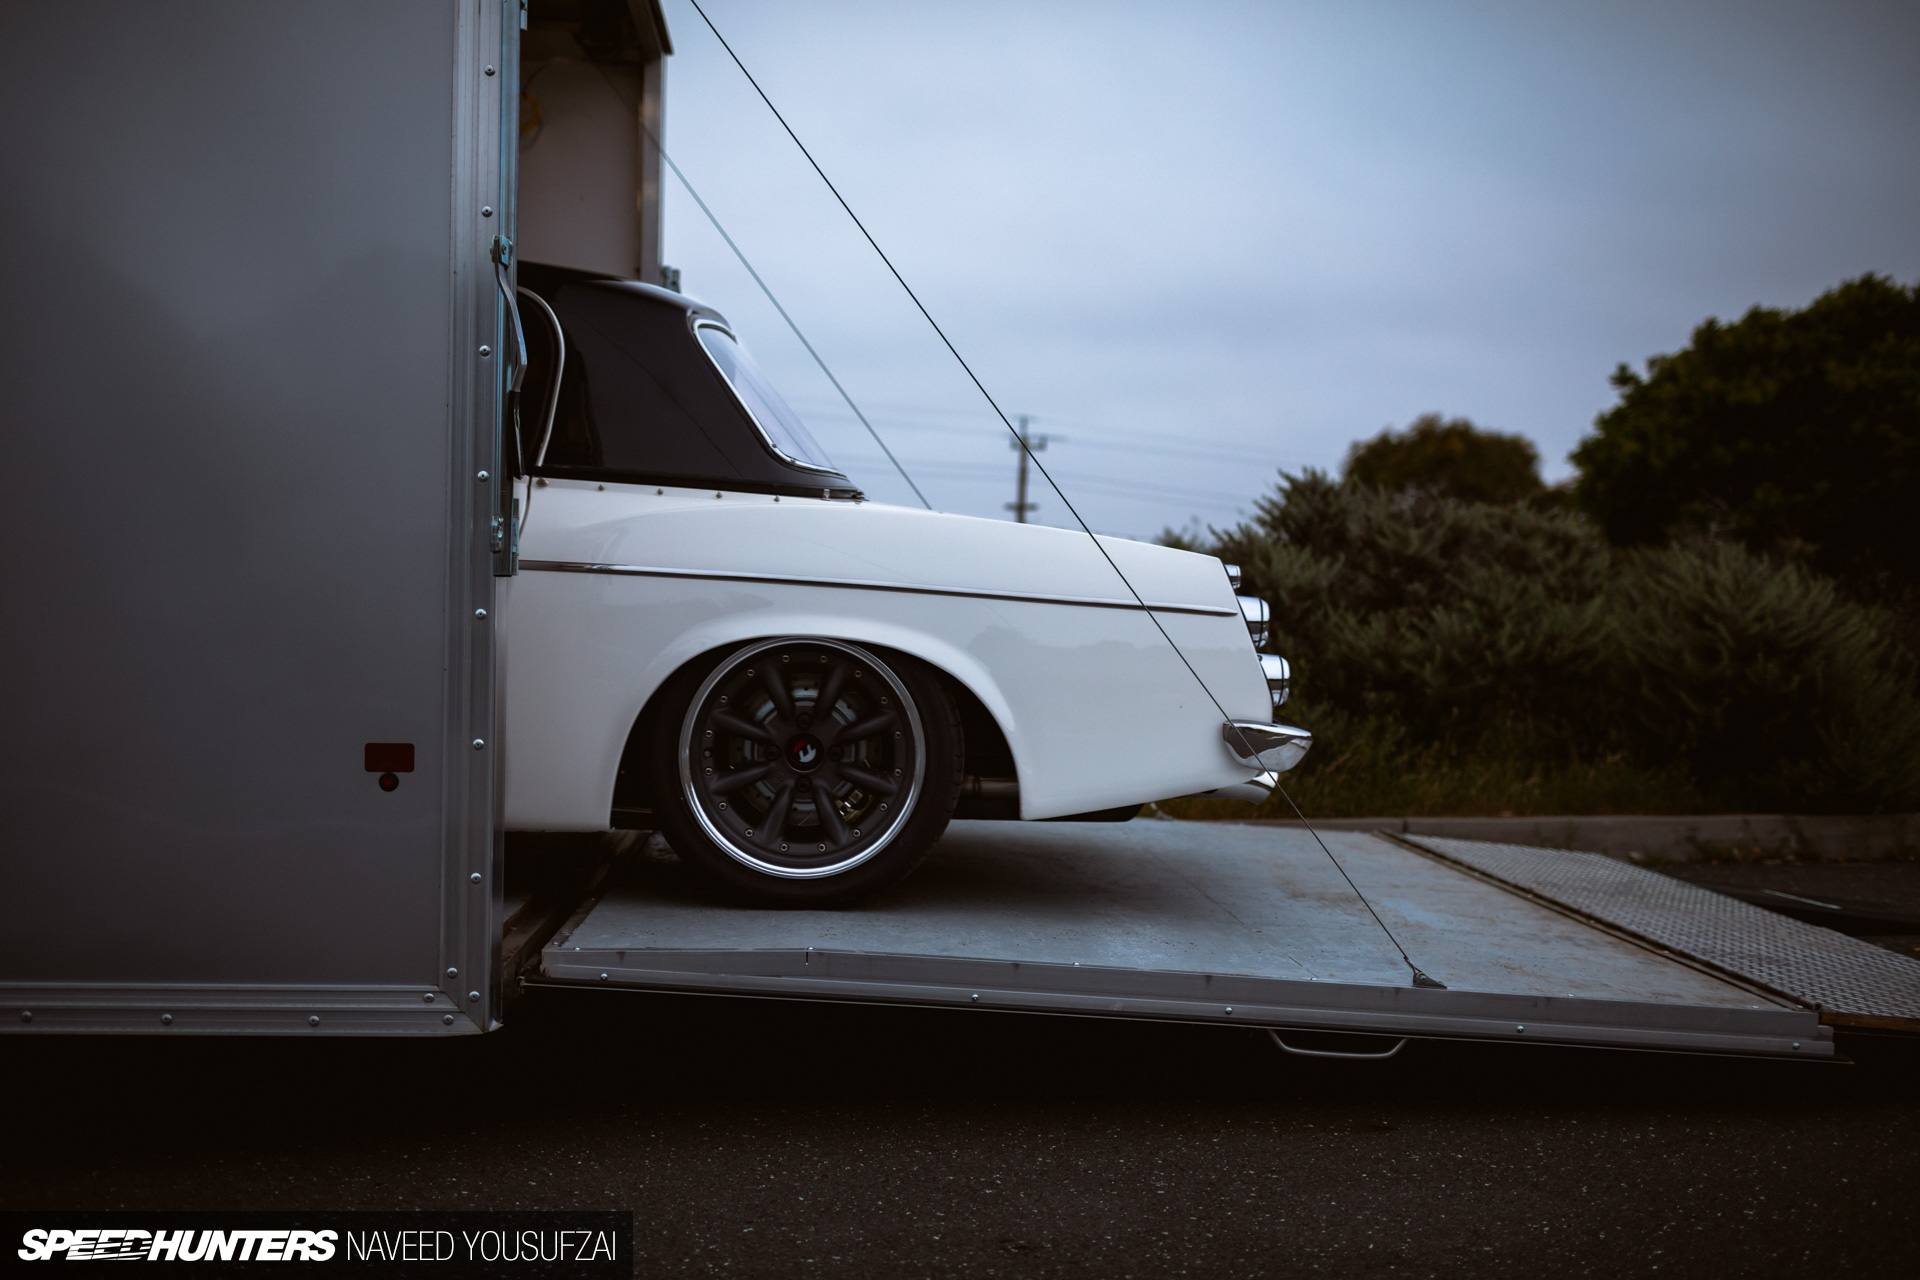 Built By Straw: Eric Straw's 500HP Datsun Fairlady - Motor